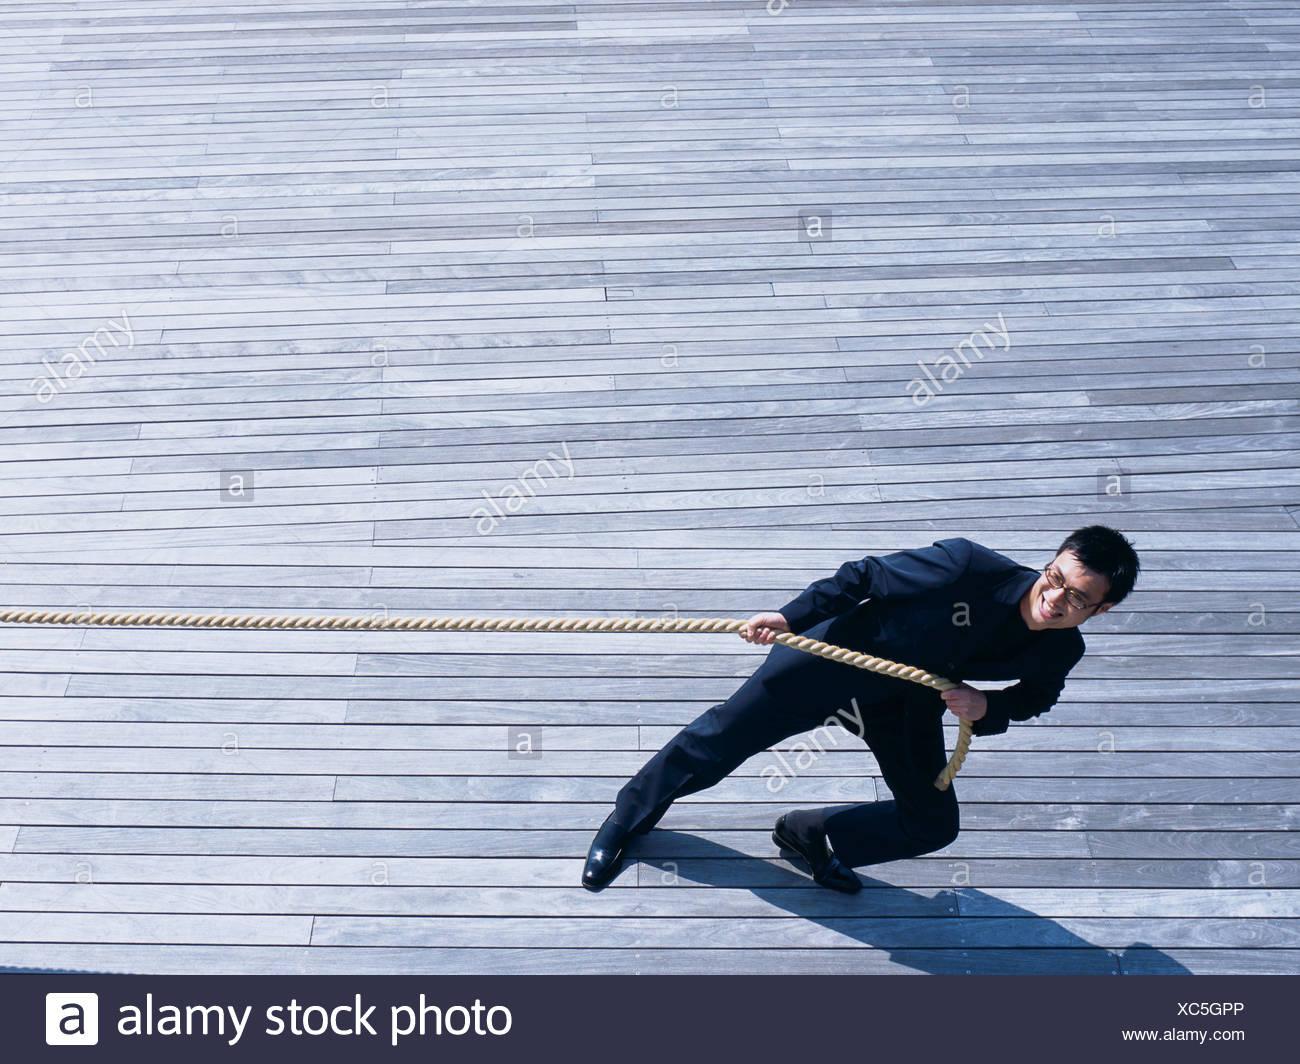 Asian Man pulling at a rope - Stock Image